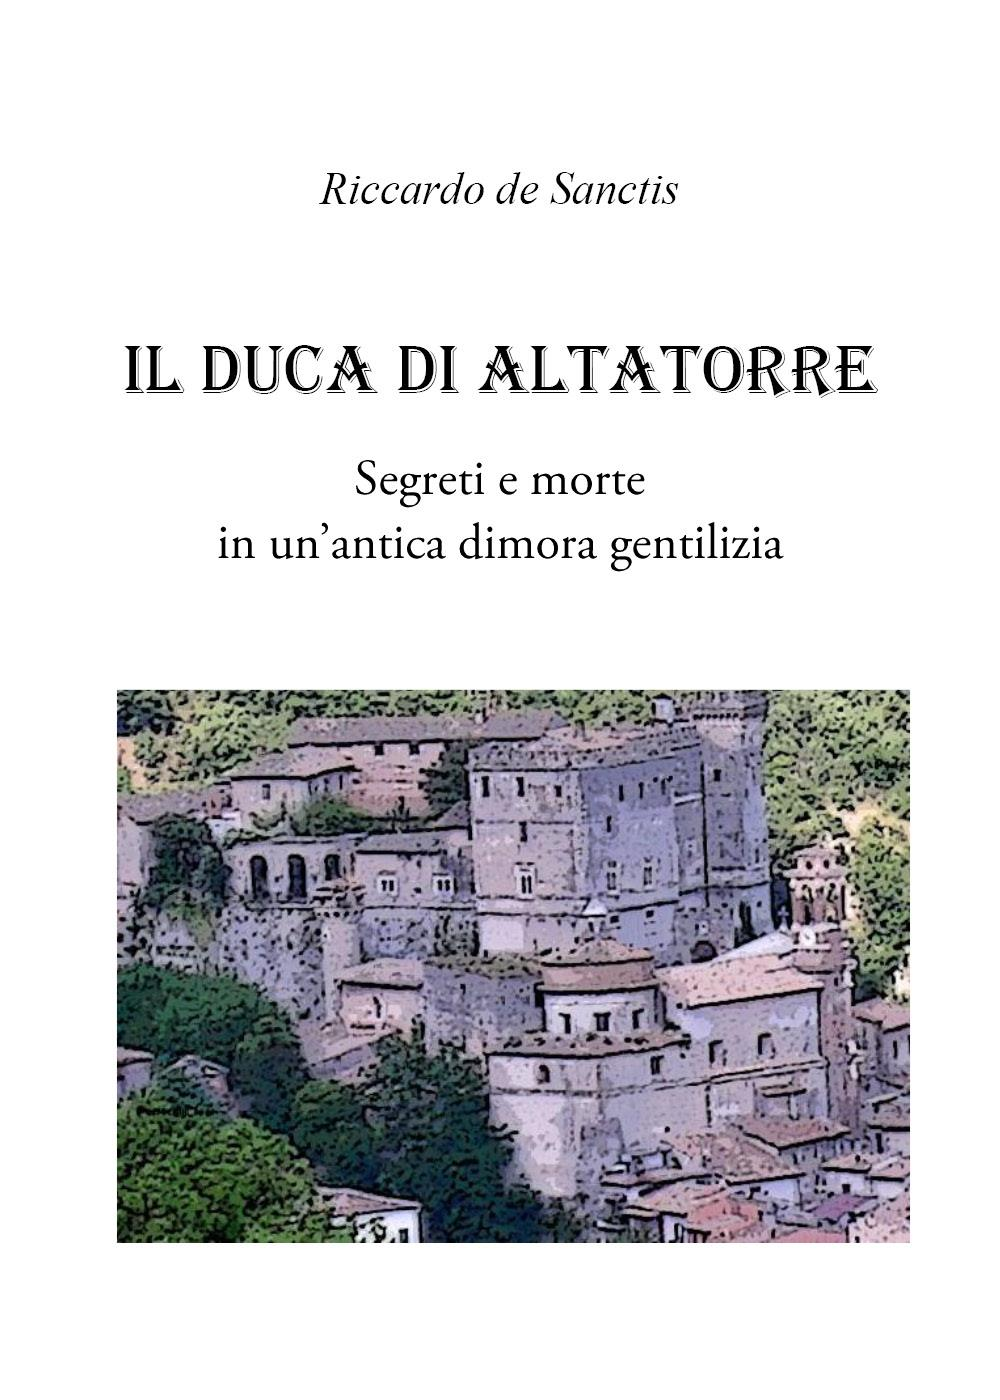 Il Duca di Altatorre